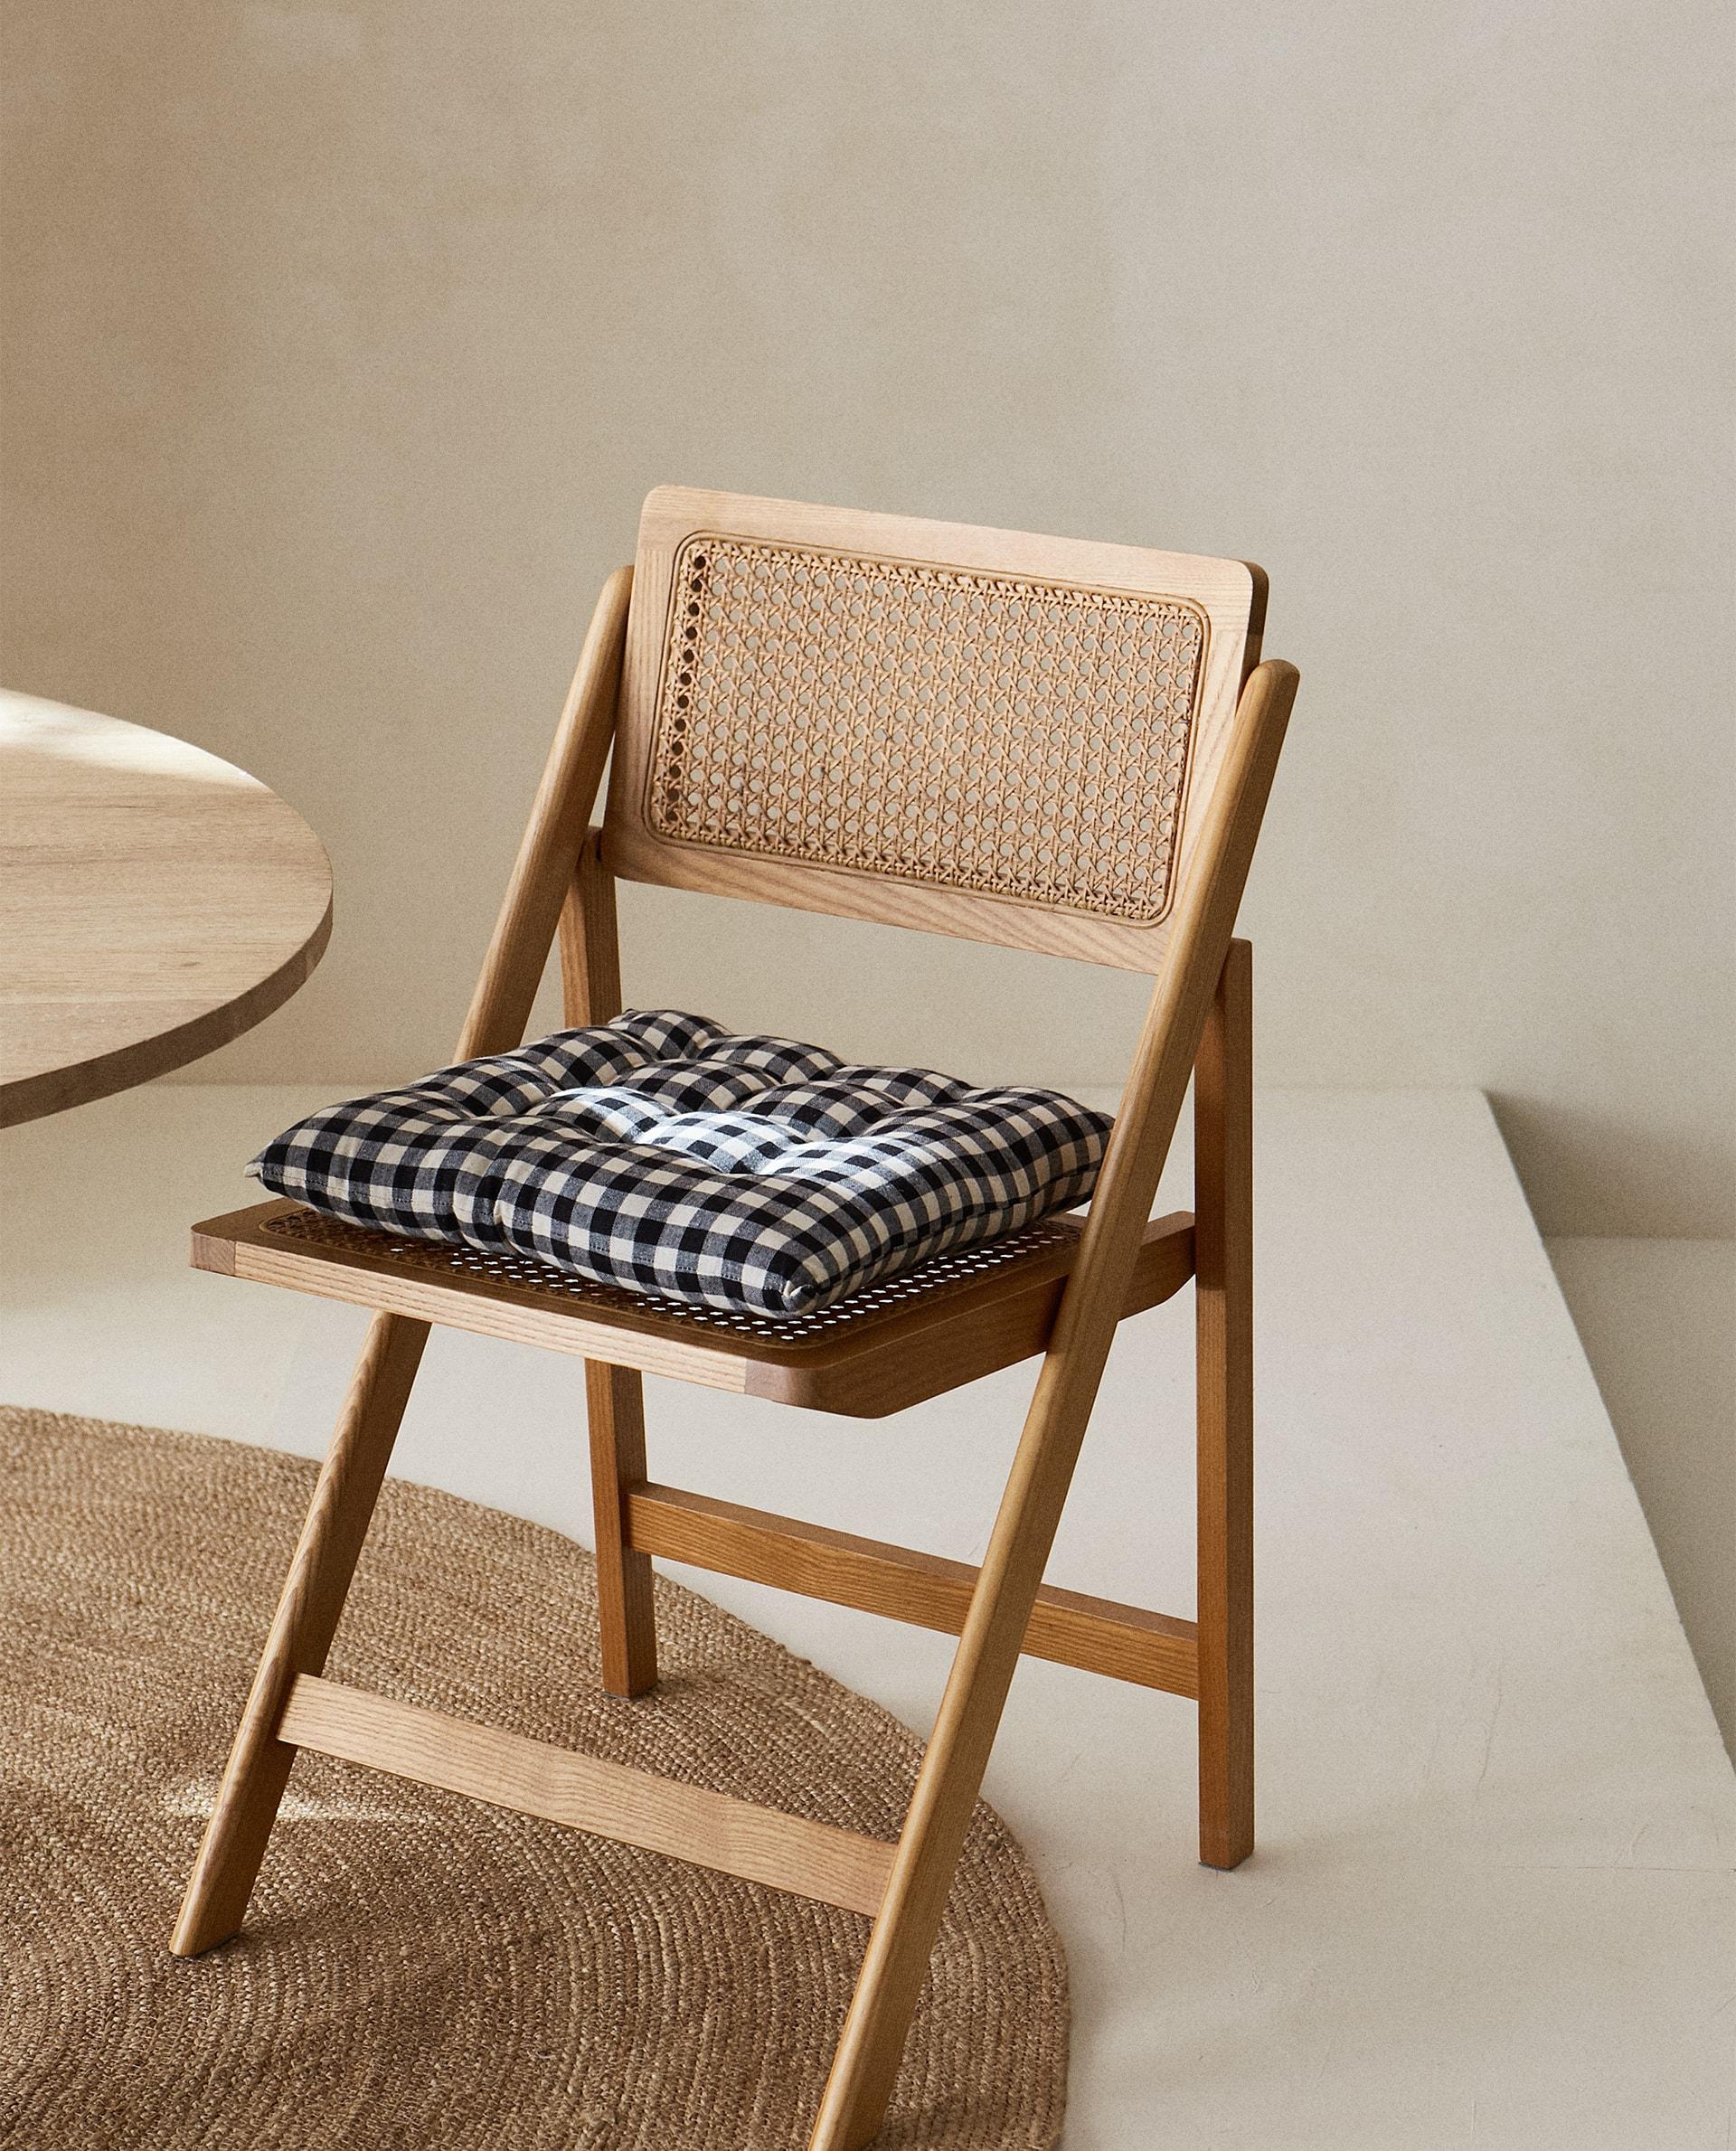 Cojín relleno para silla con diseño de cuadros en blanco y negro de Zara Home (12,99 euros) / Zara Home